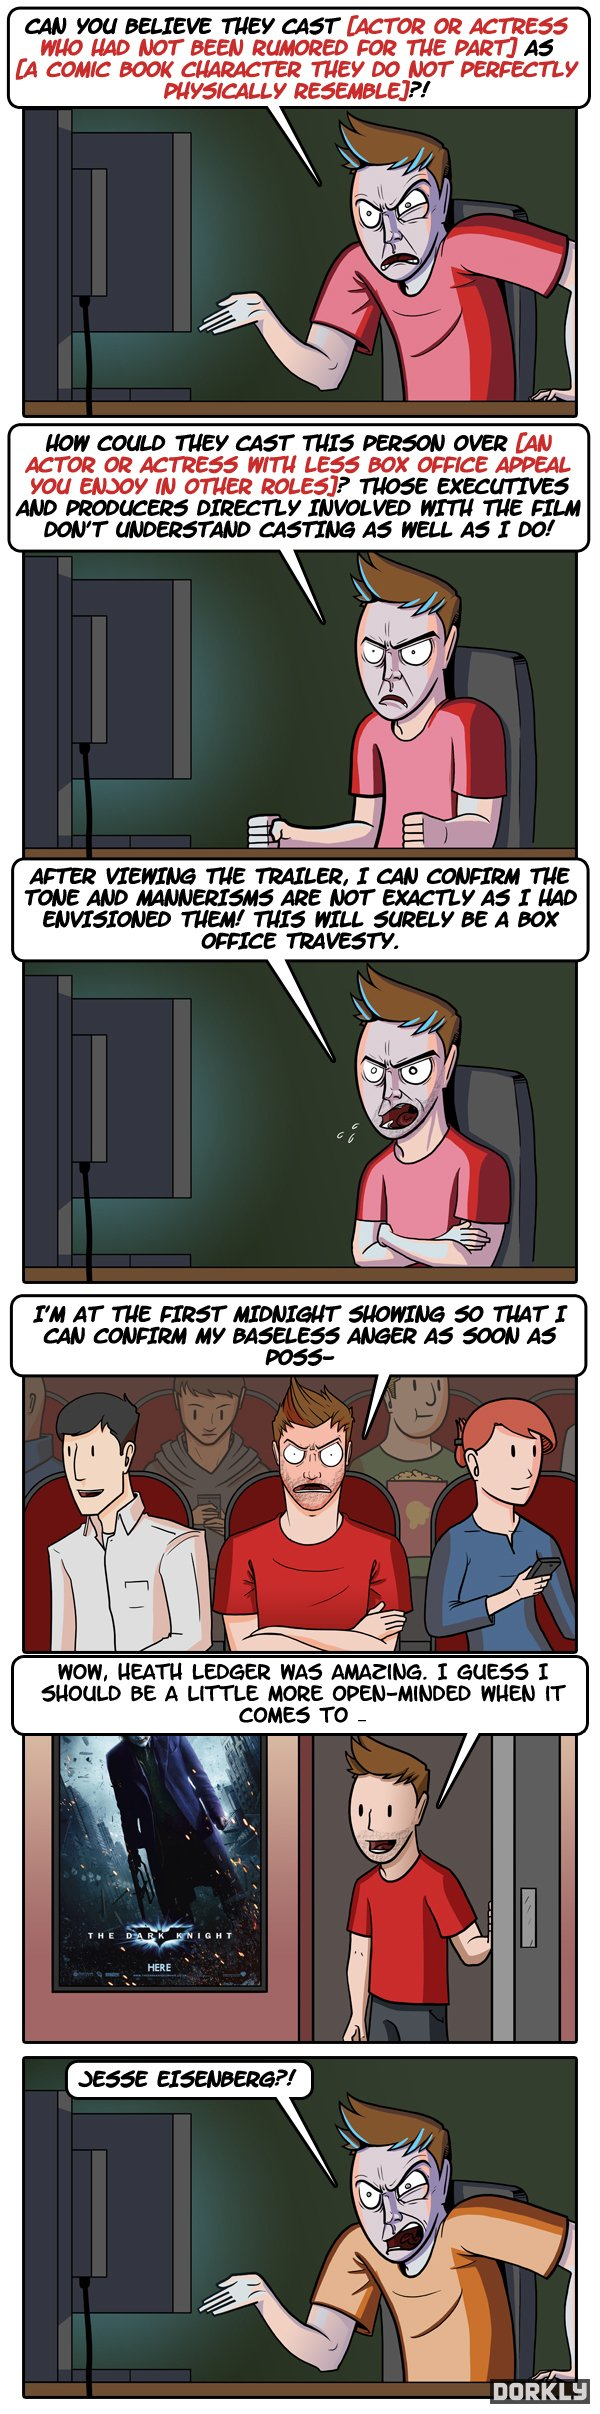 comic book movie casting